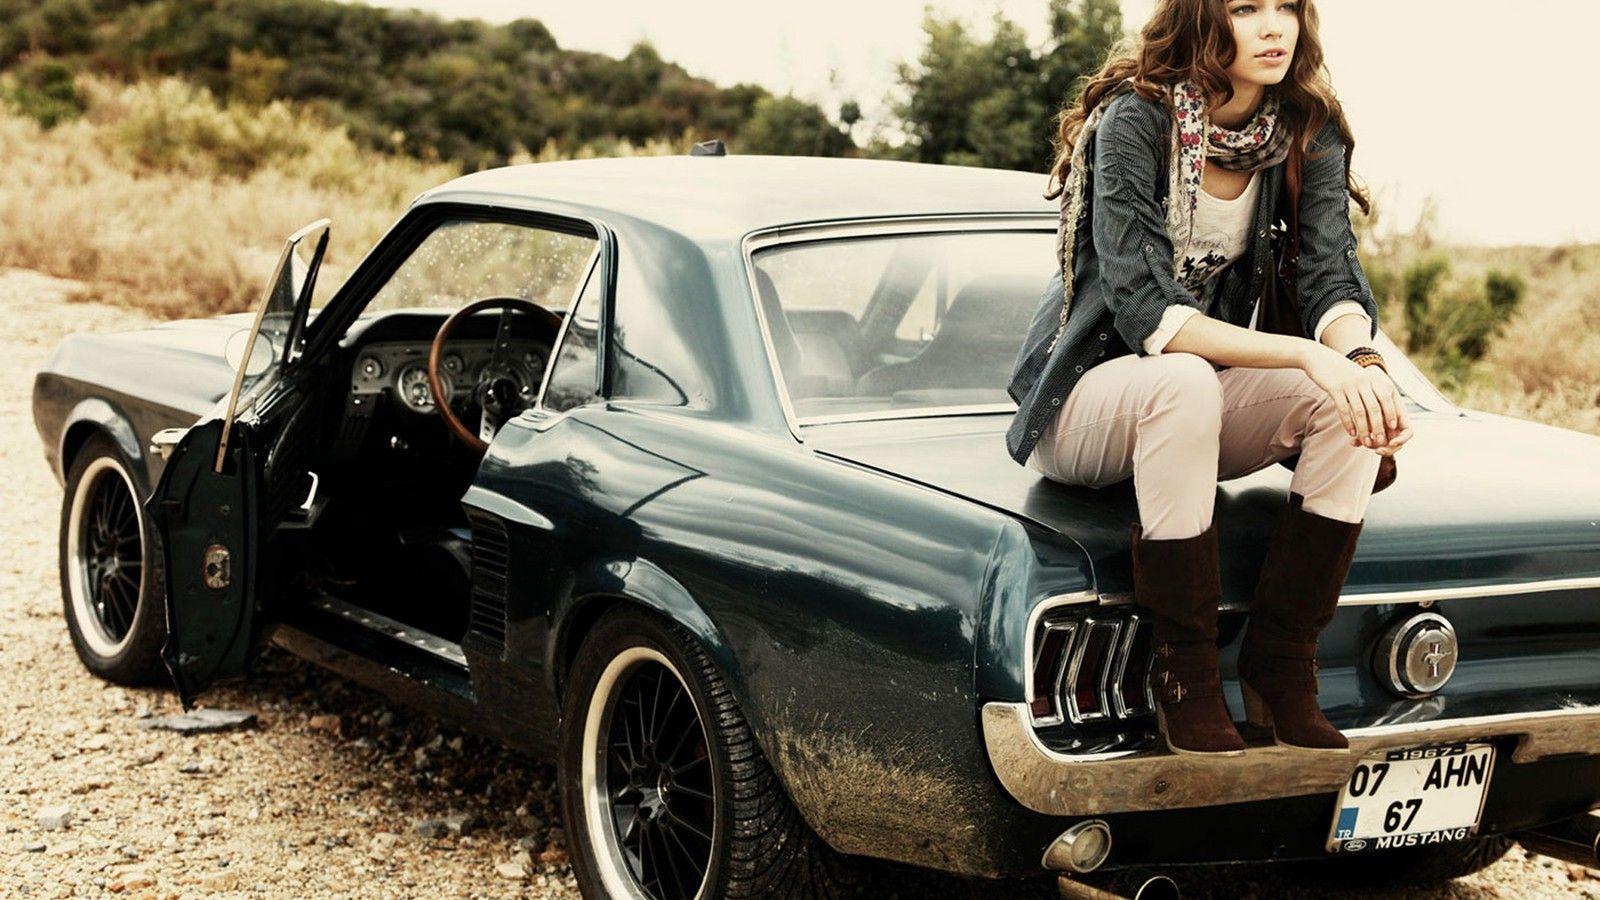 Rustic Mustang Mustang Girl Ford Mustang 1967 Mustang